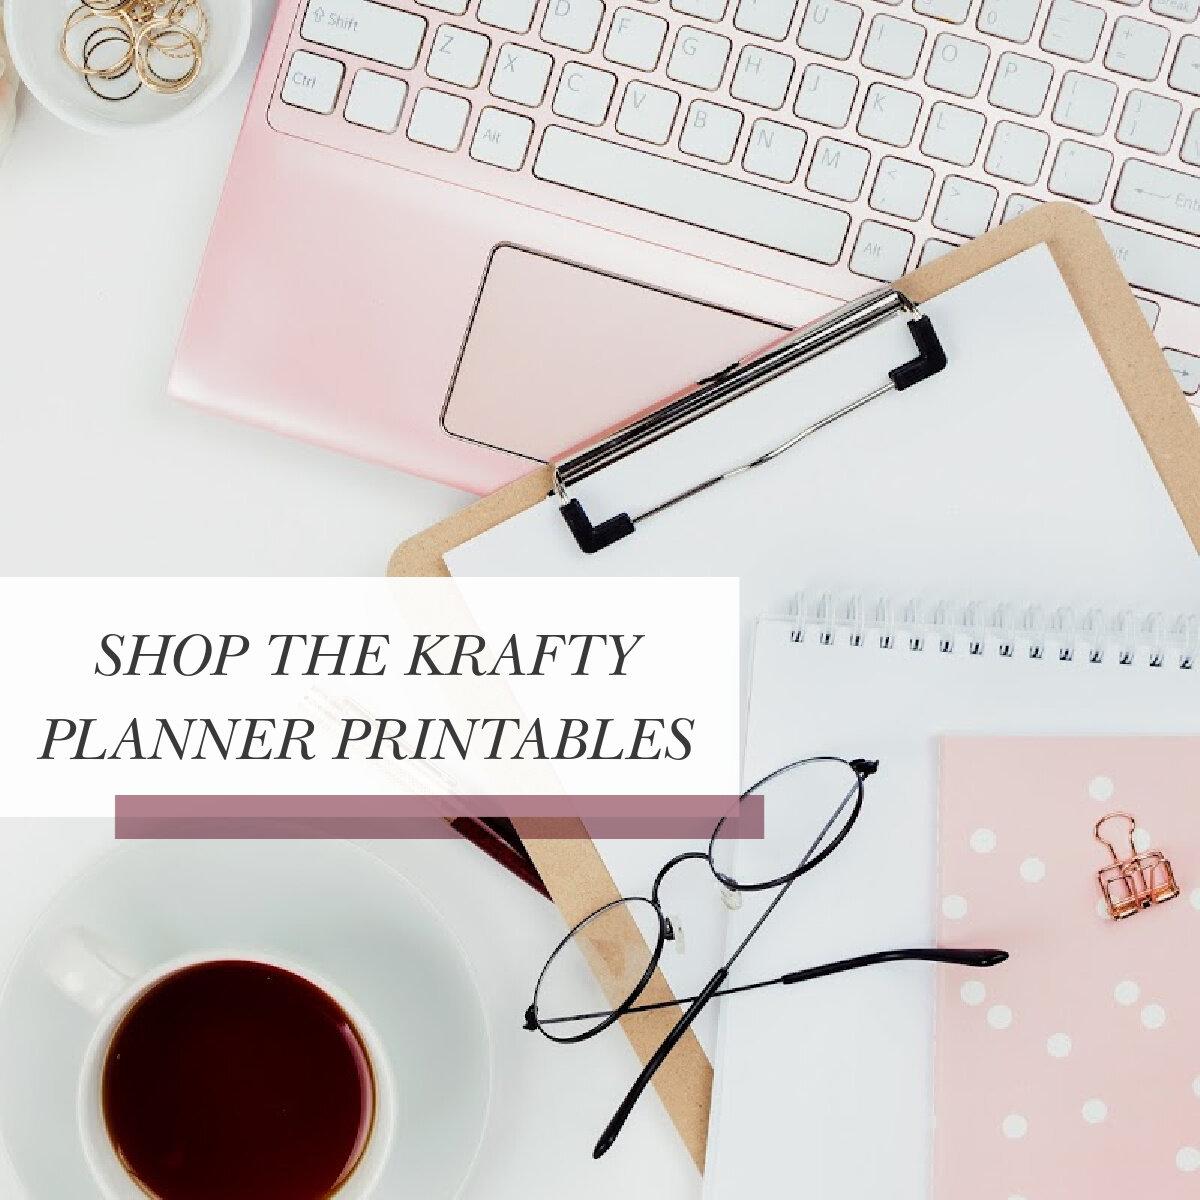 Shop the Krafty Planner Printables.jpg